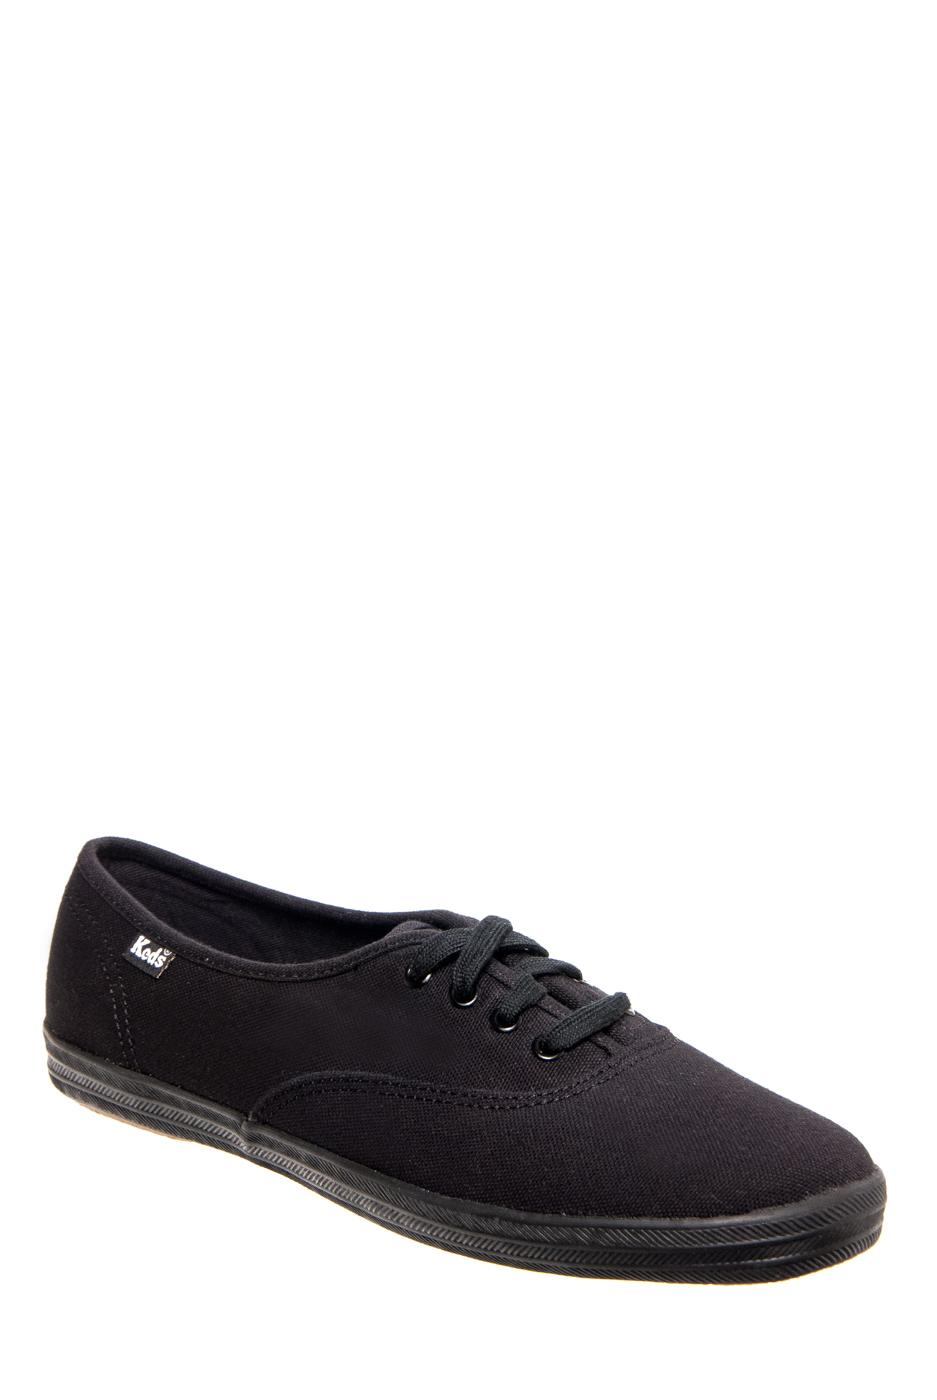 KEDS Champion Ox Sneakers - Black / Black